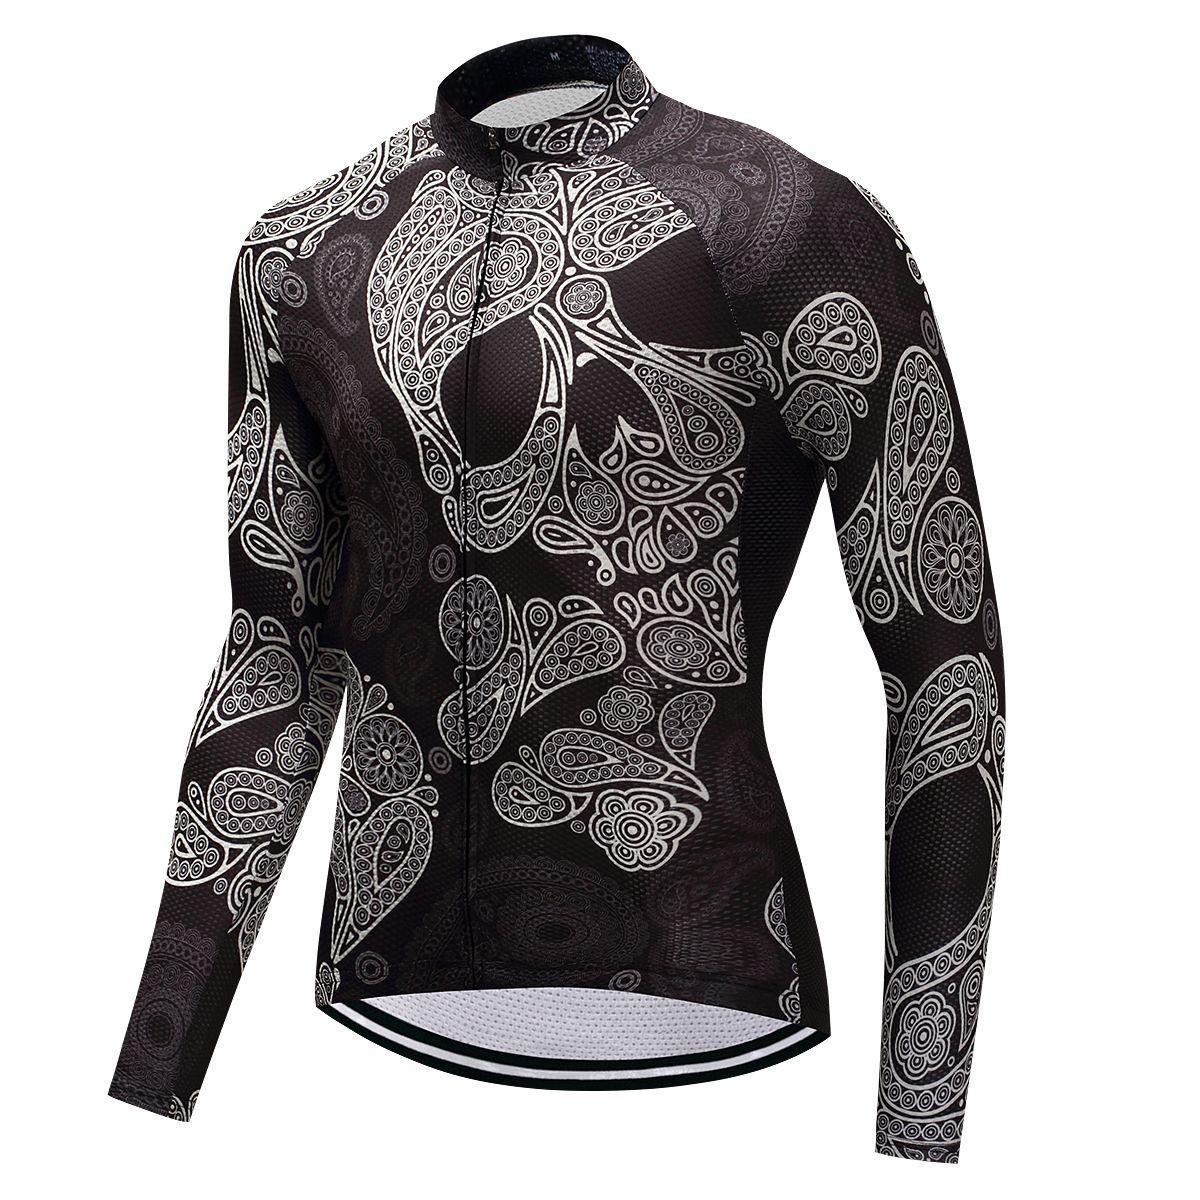 Fualrny Warm 2018 Pro Winter Thermal Fleece Cycling Jersey Ropa Ciclismo Mtb Long Sleeve Men Bike Wear Clothing Maillot #ZR-06